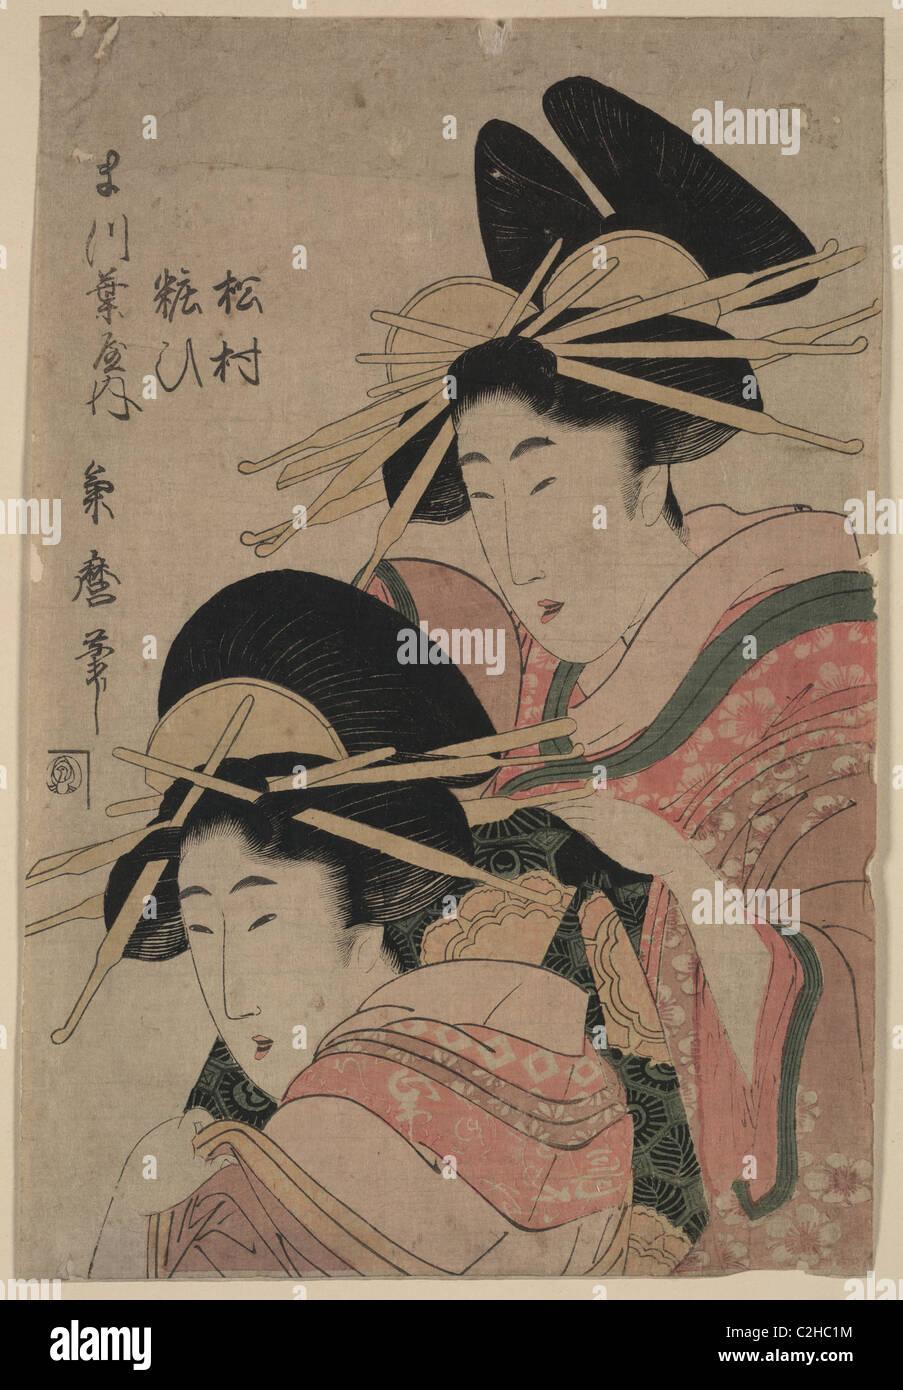 Two Women - Stock Image